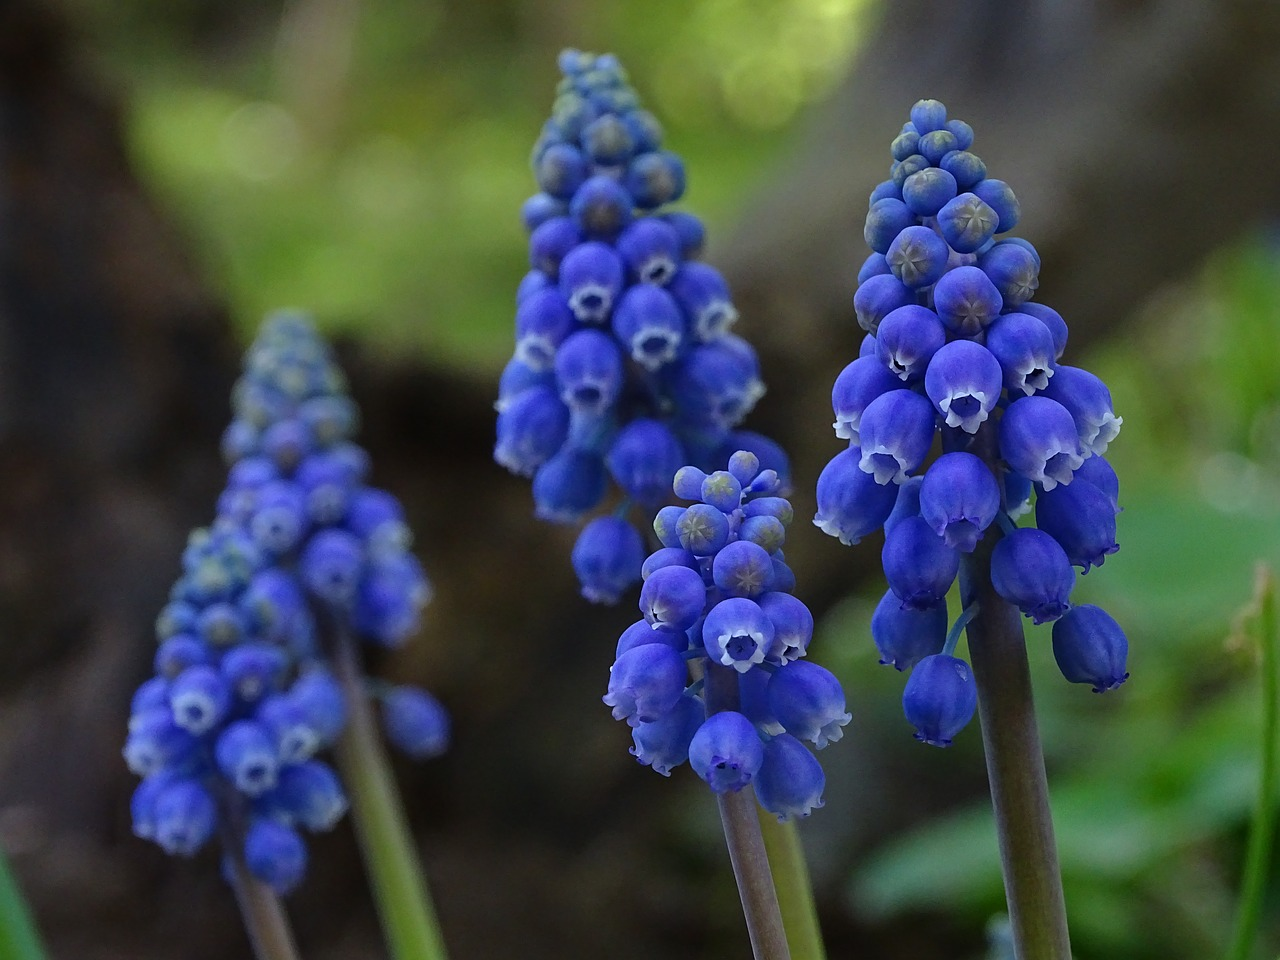 цветок синий мышиный фото такого ключа